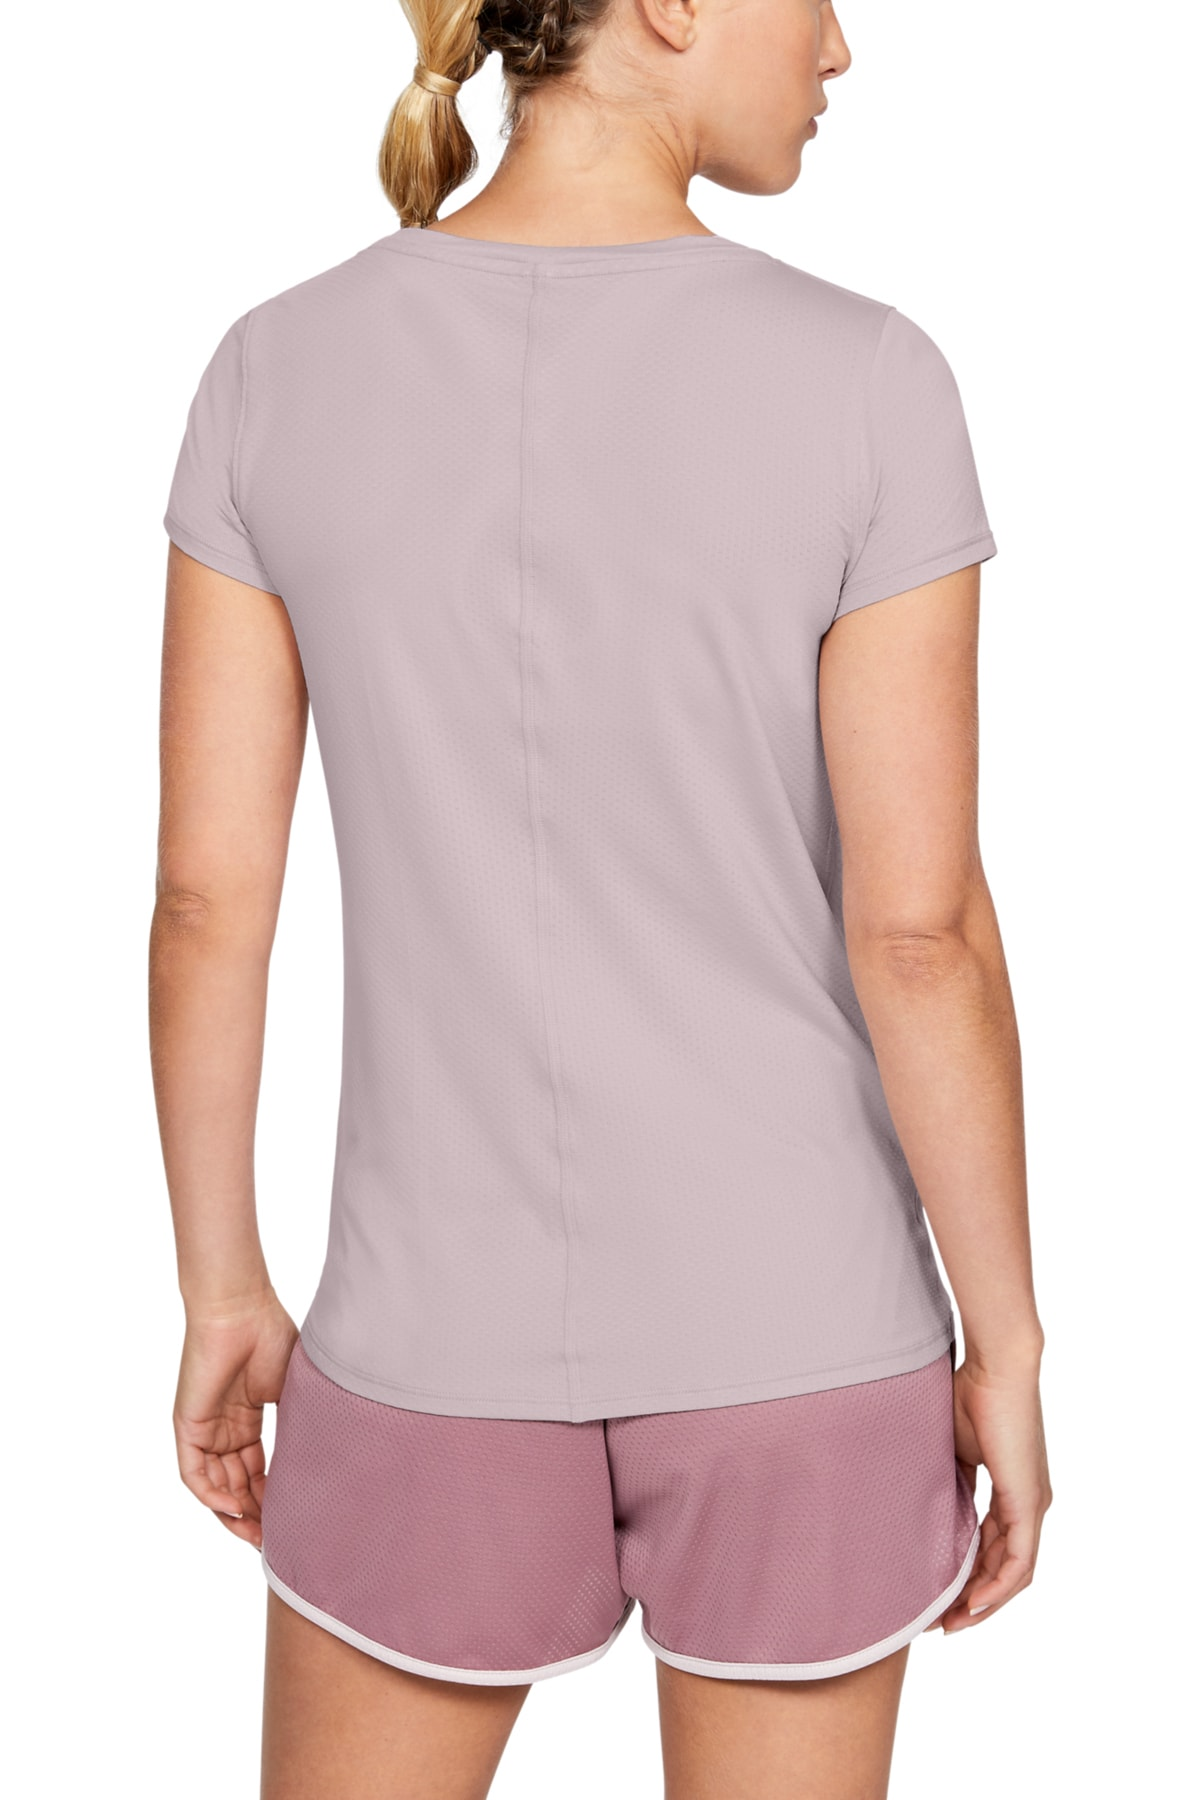 Under Armour Kadın Spor T-Shirt - Ua Hg Armour Ss - 1328964-667